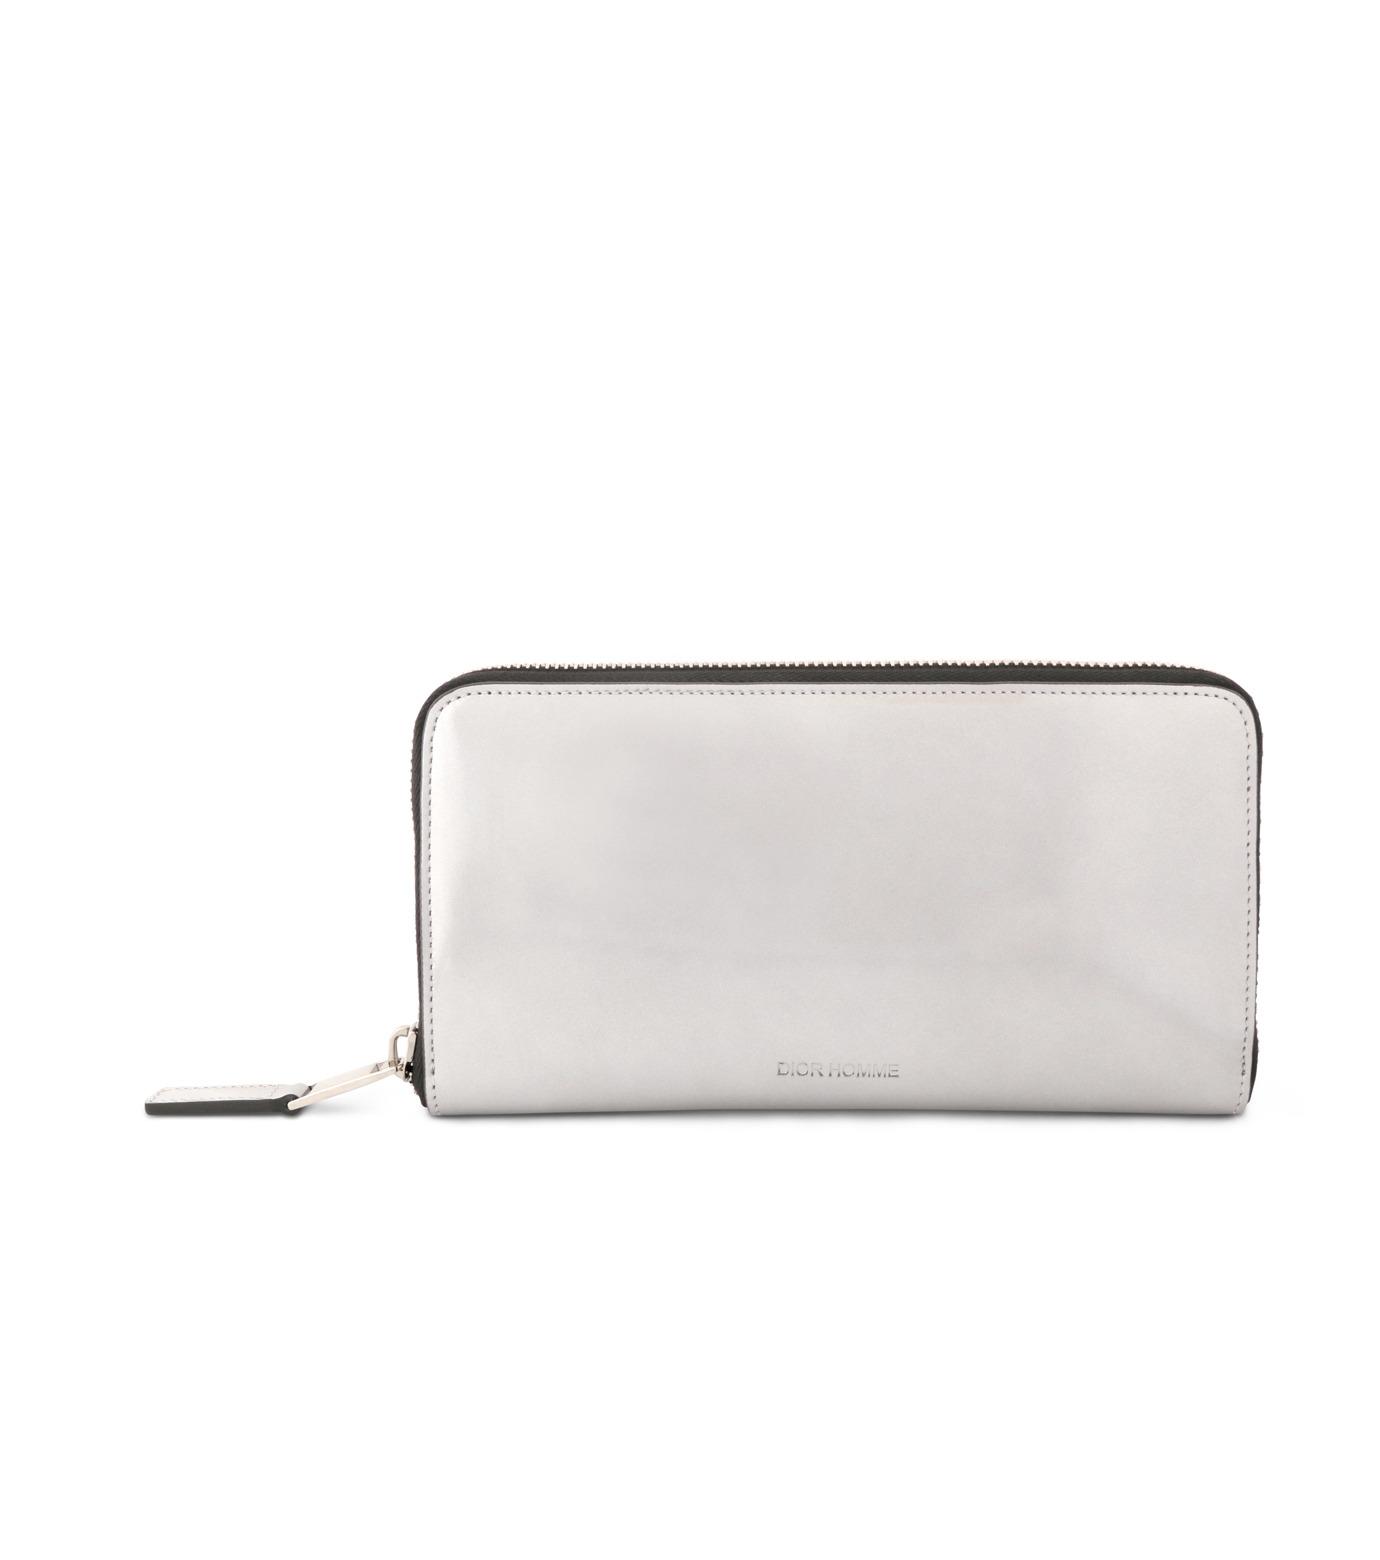 Dior Homme(ディオール オム)のSilver Wallet-SILVER-2DEBC011XJD-1 拡大詳細画像1